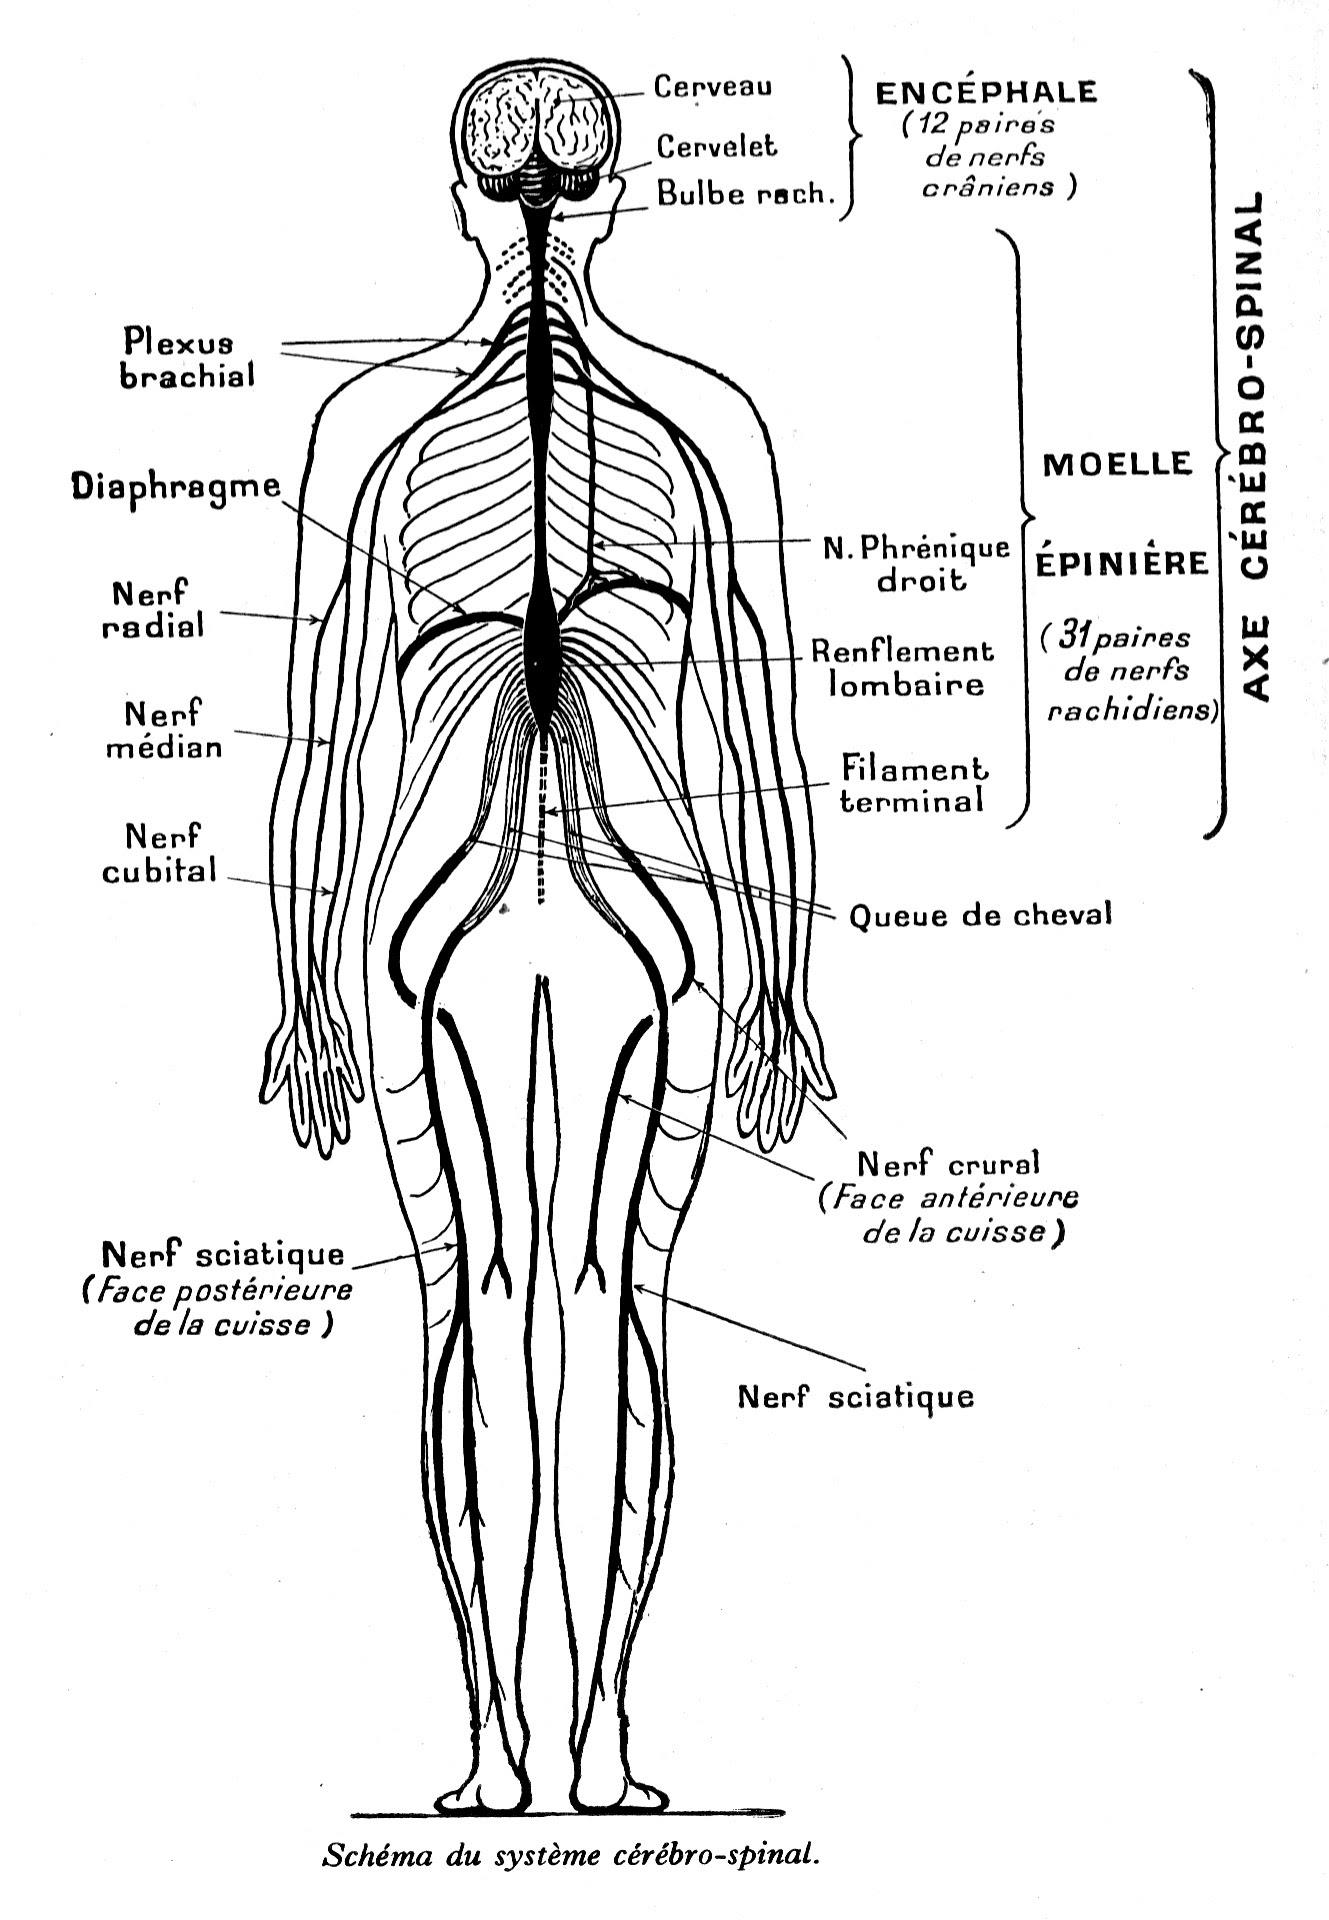 Anatomie du corps humain schéma du syst¨me cérébro spinal